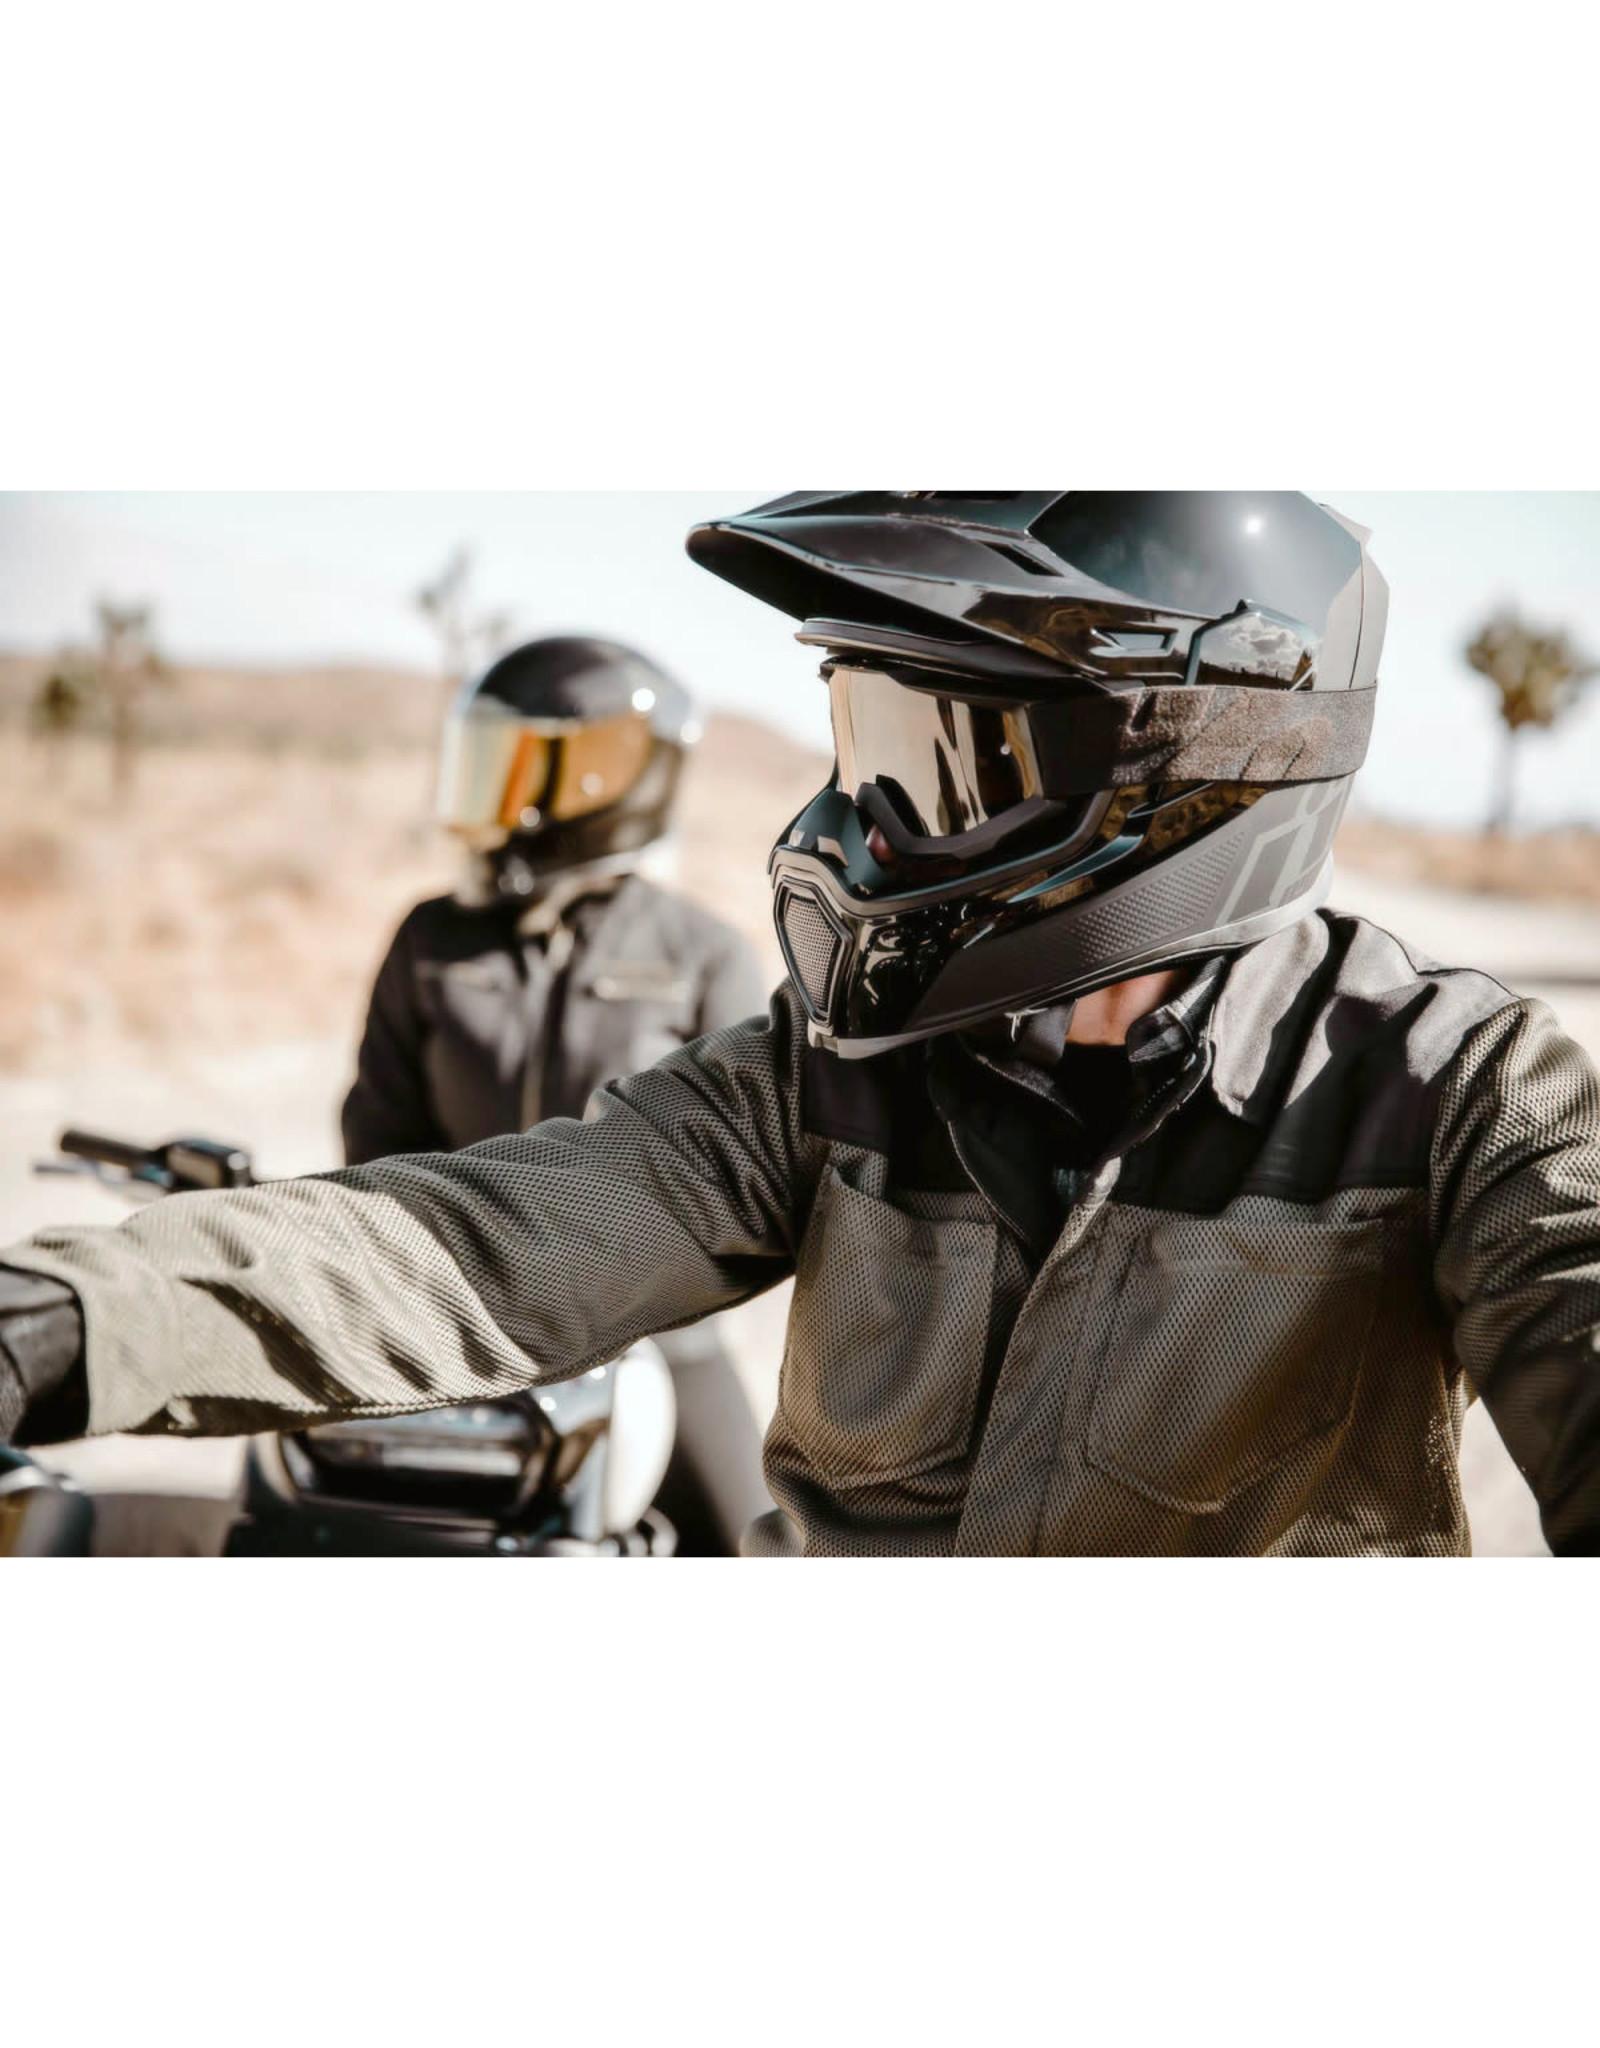 ICON ICON Airflite MIPS Stealth Helmet